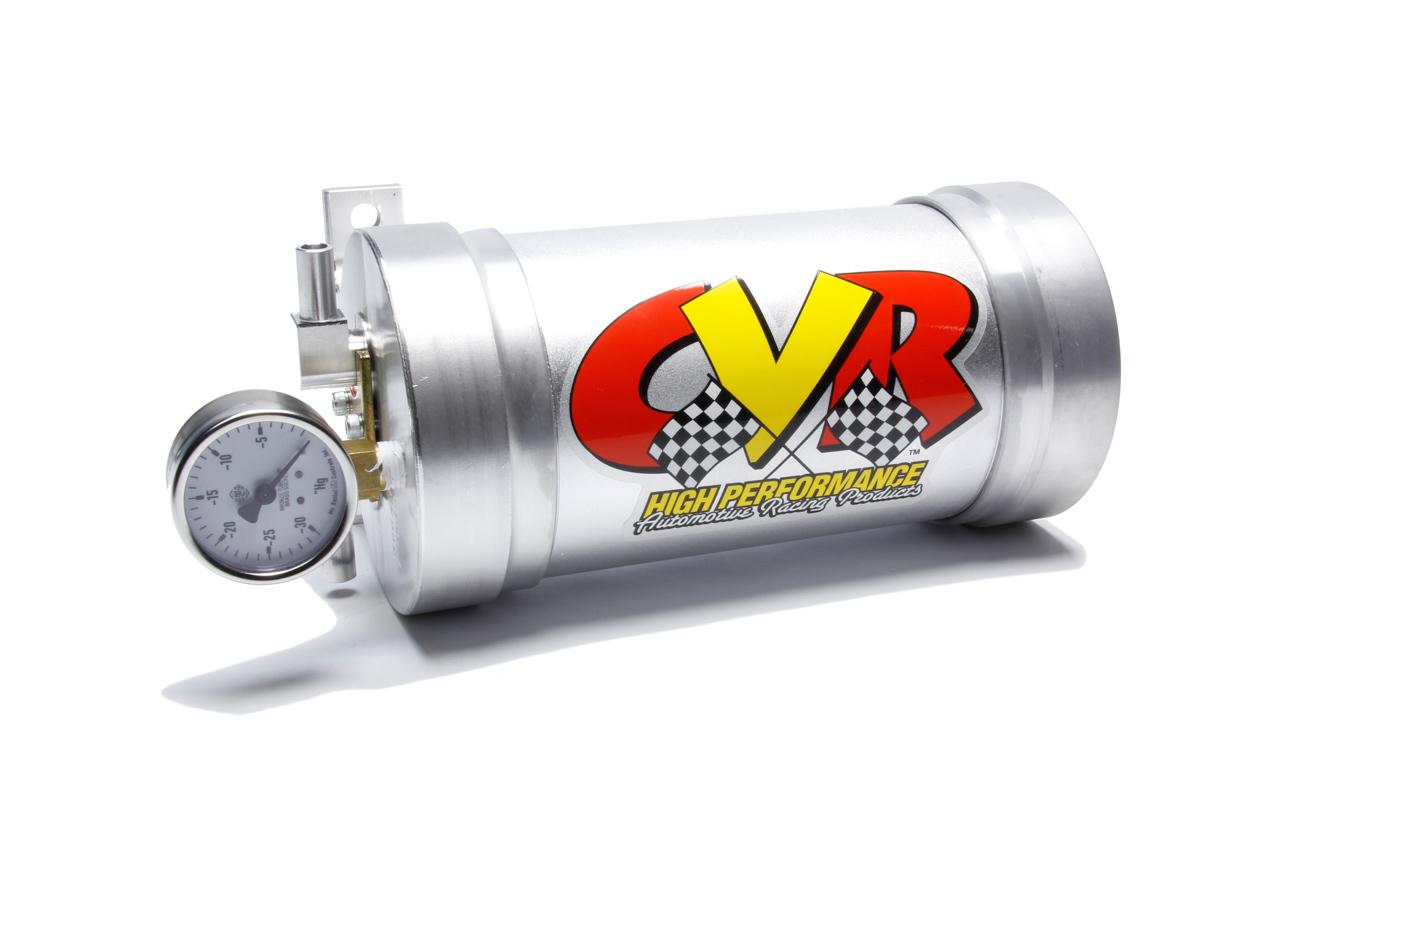 Cvr Performance Vacuum Reservoir